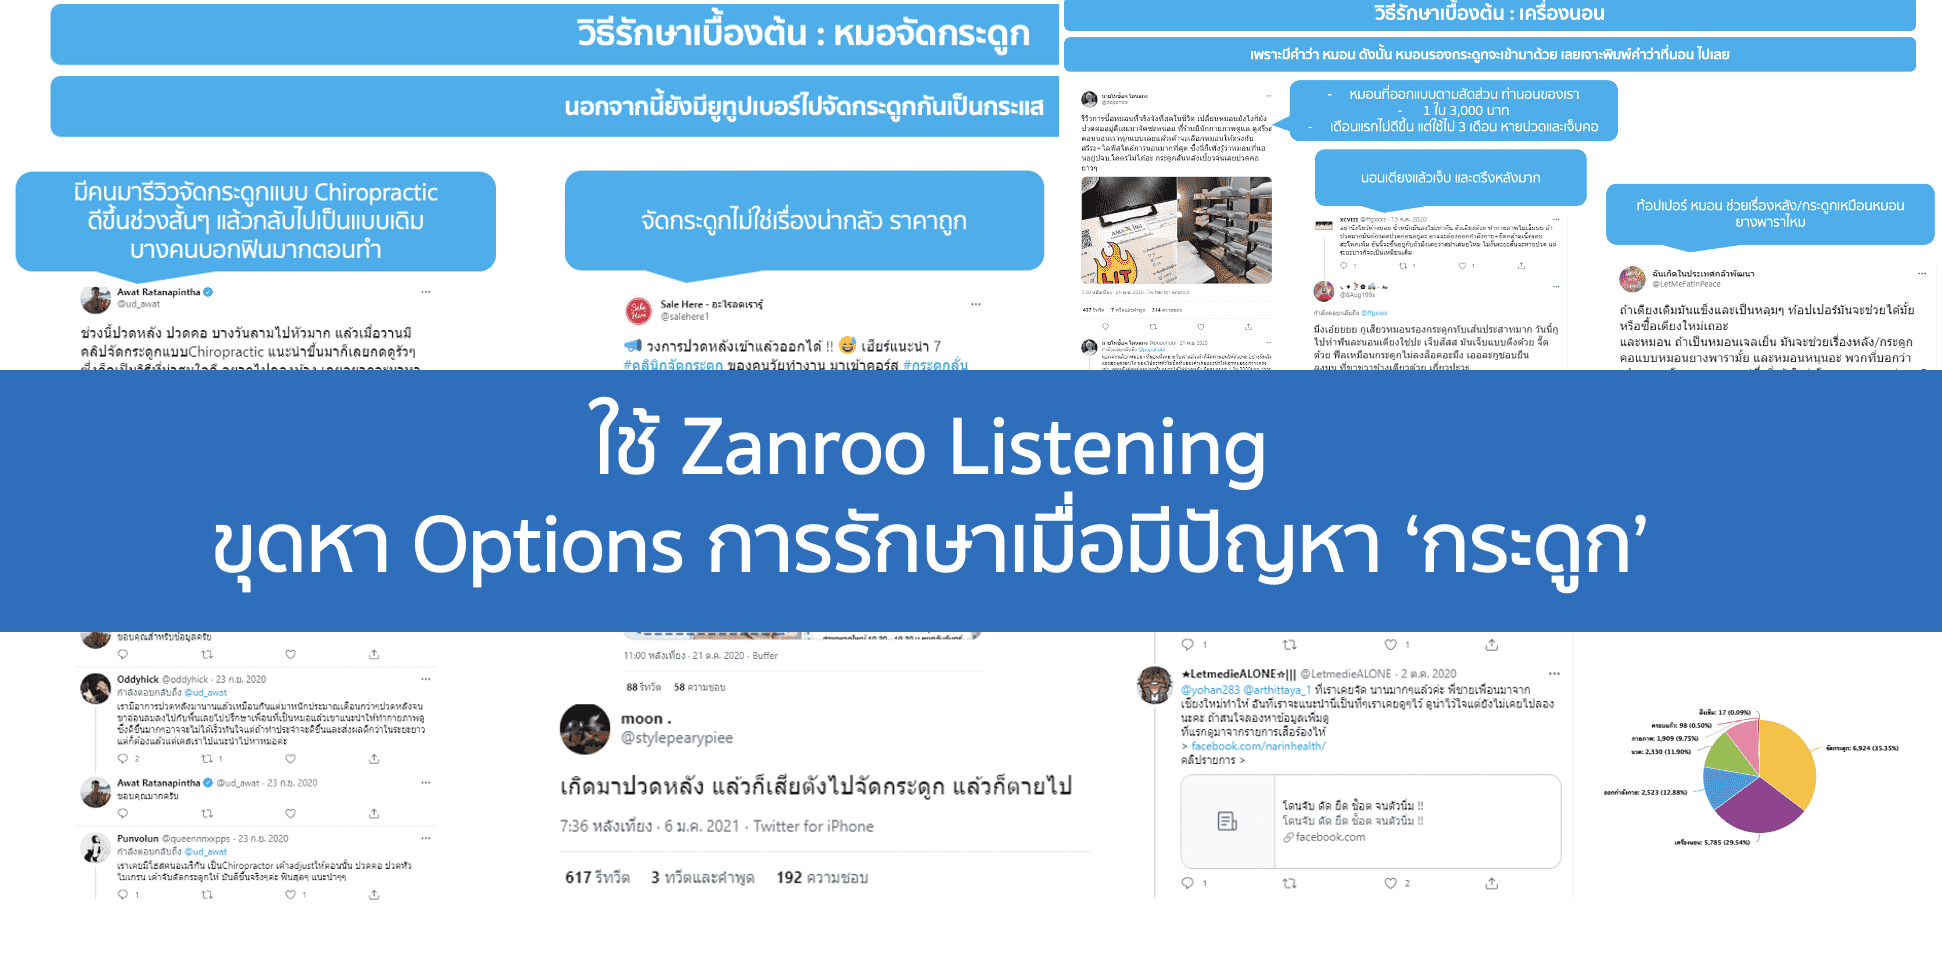 Research จาก Data เผย Insight คนไทยคิดถึงอะไรเมื่อมีปัญหาเรื่องกระดูก